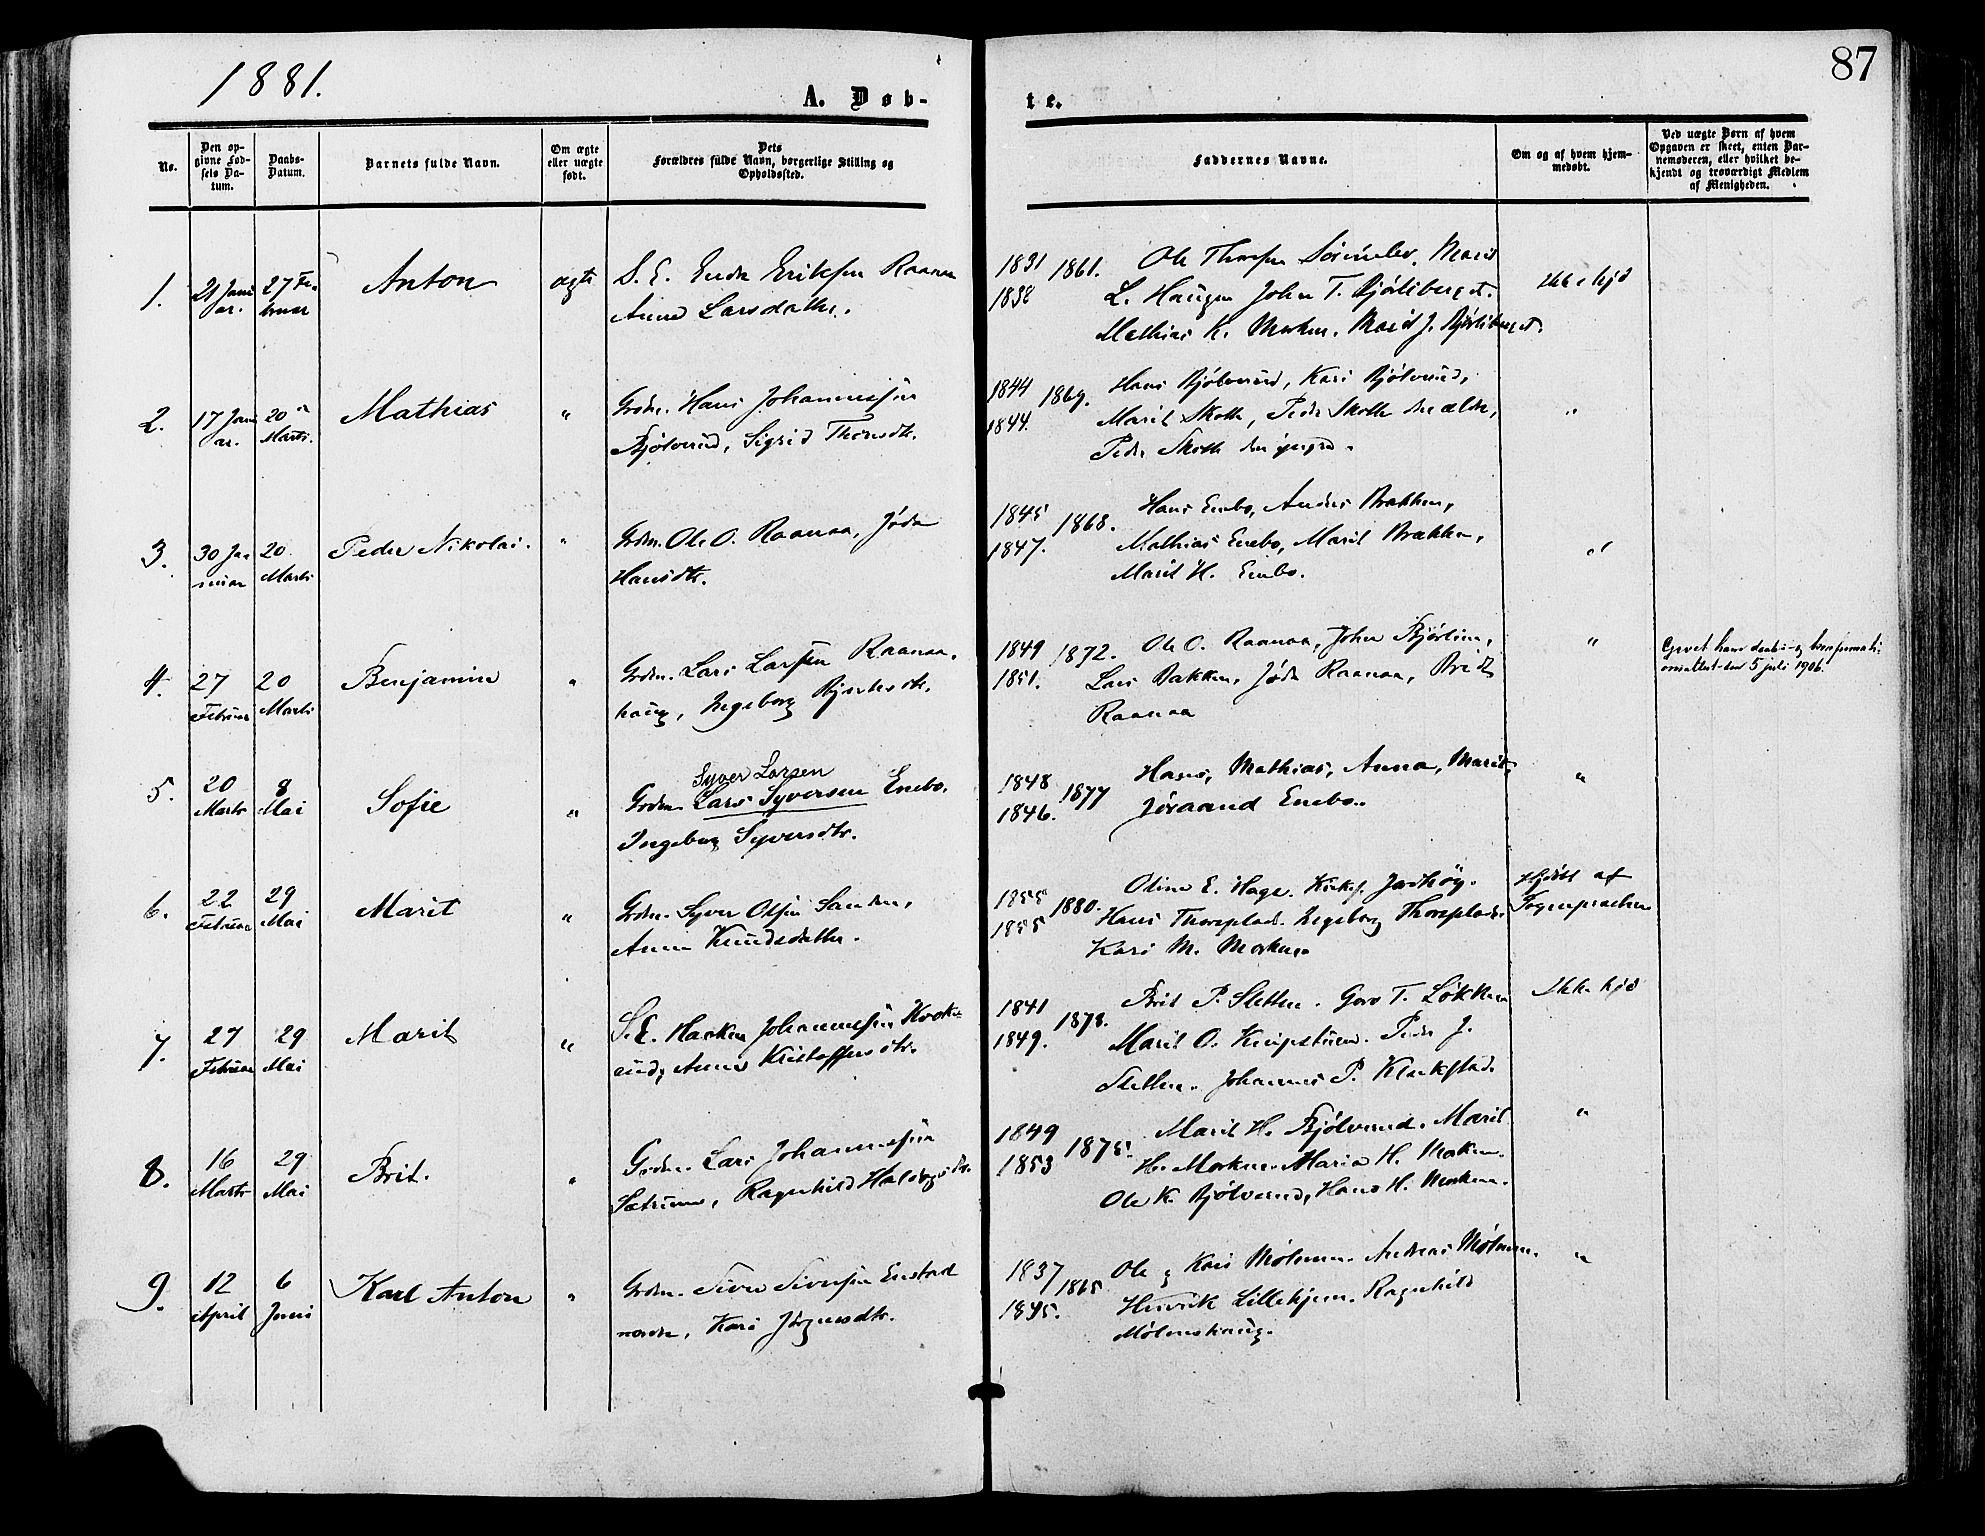 SAH, Lesja prestekontor, Ministerialbok nr. 9, 1854-1889, s. 87